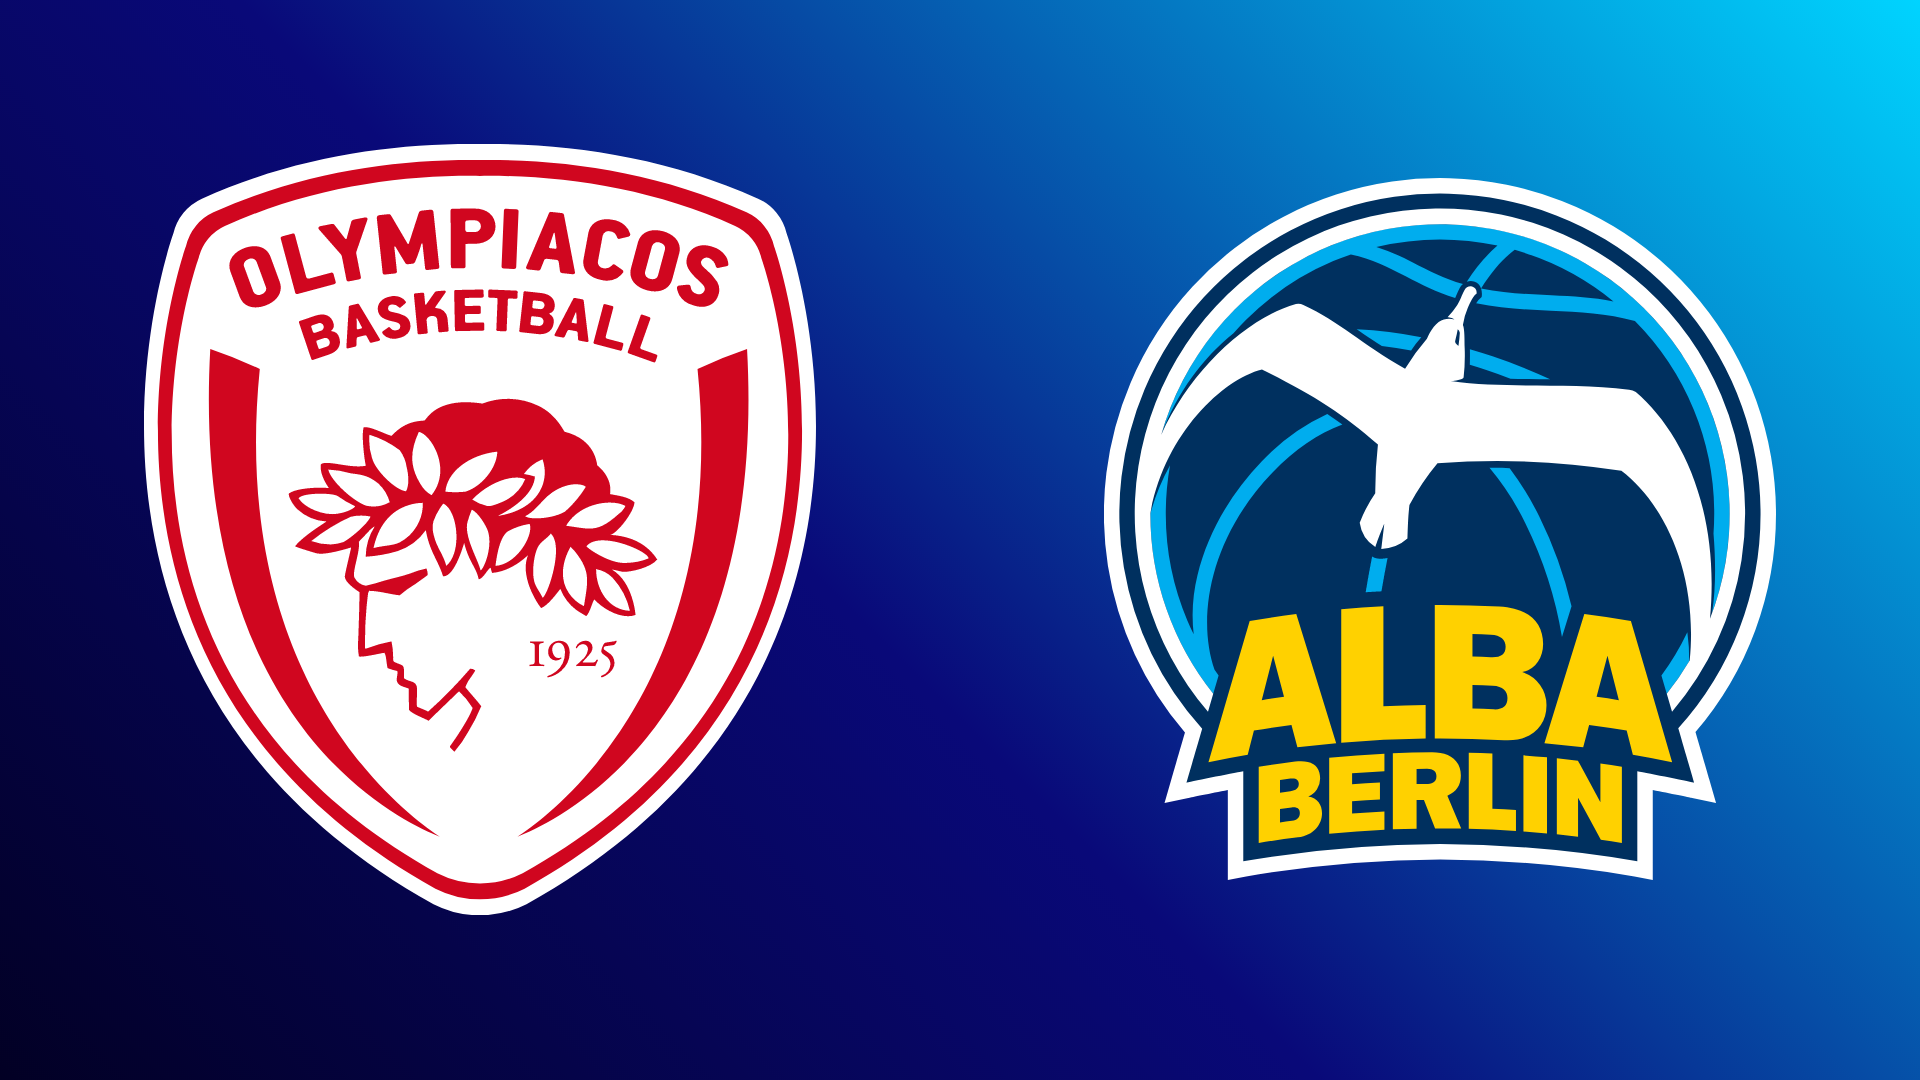 Olympiakos Piräus - ALBA BERLIN 26.10.2021 um 19:45 Uhr auf Magenta Sport